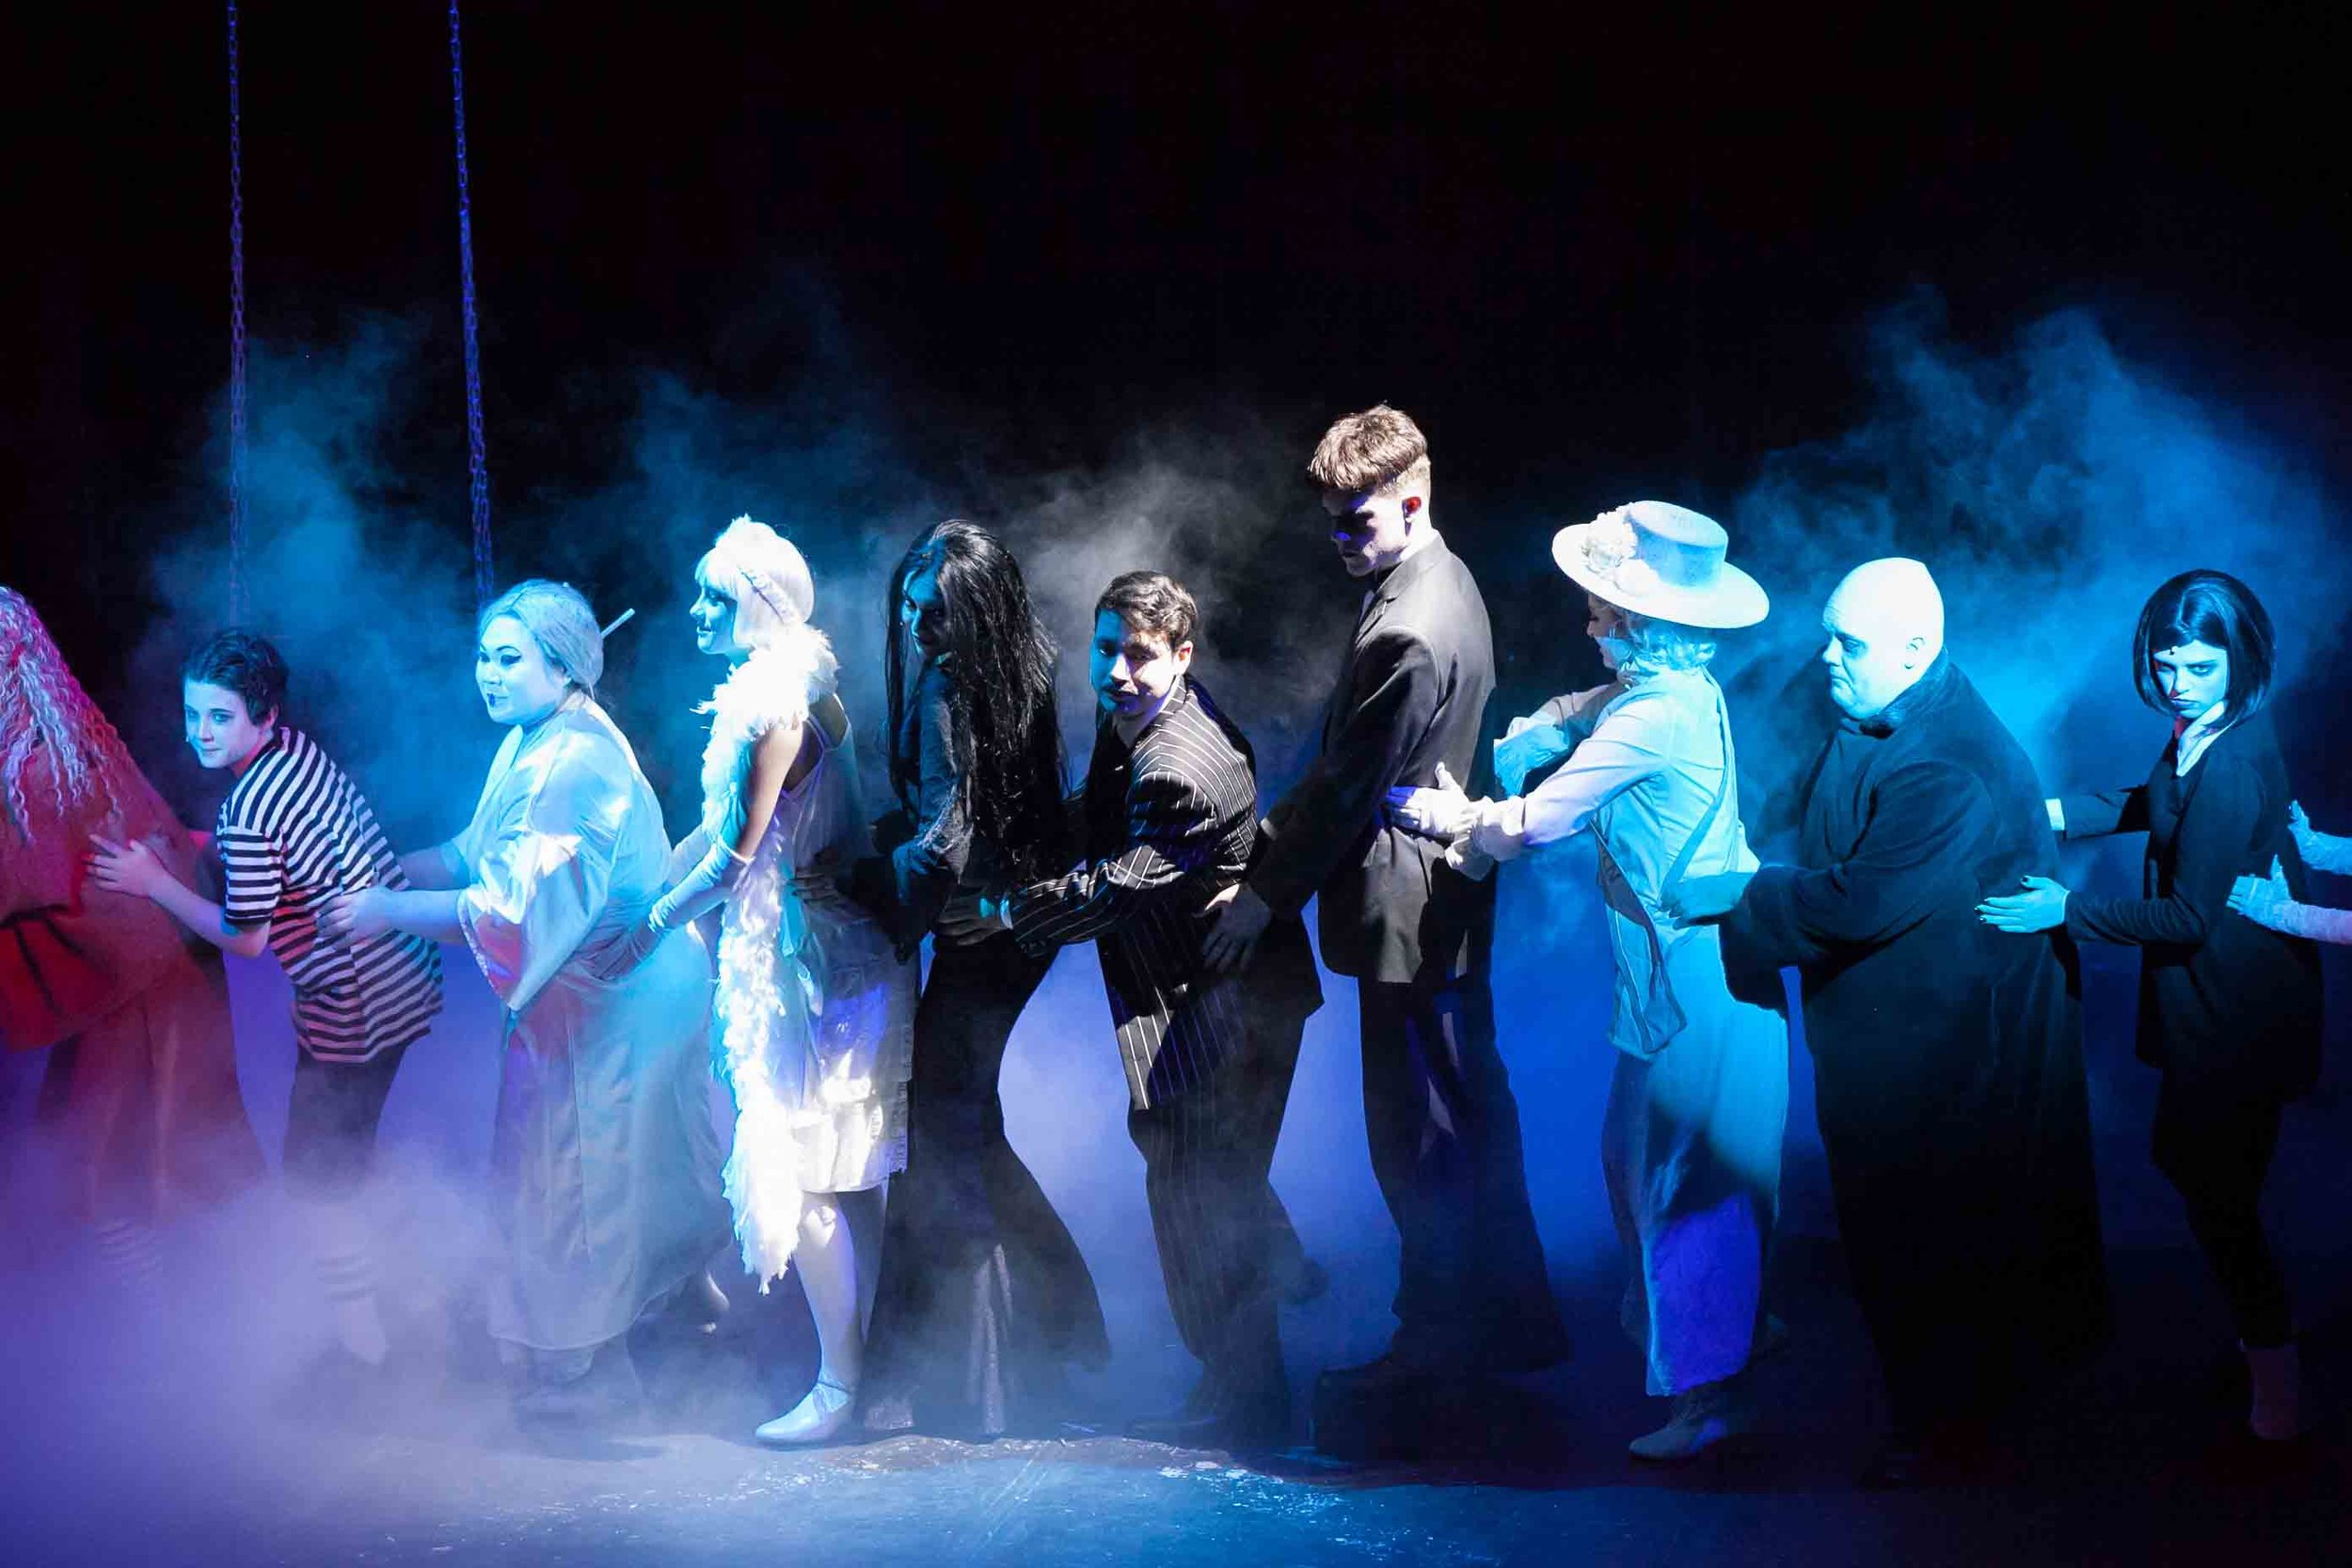 6-19-16 Addams Family Kooky Cast 0044.jpg